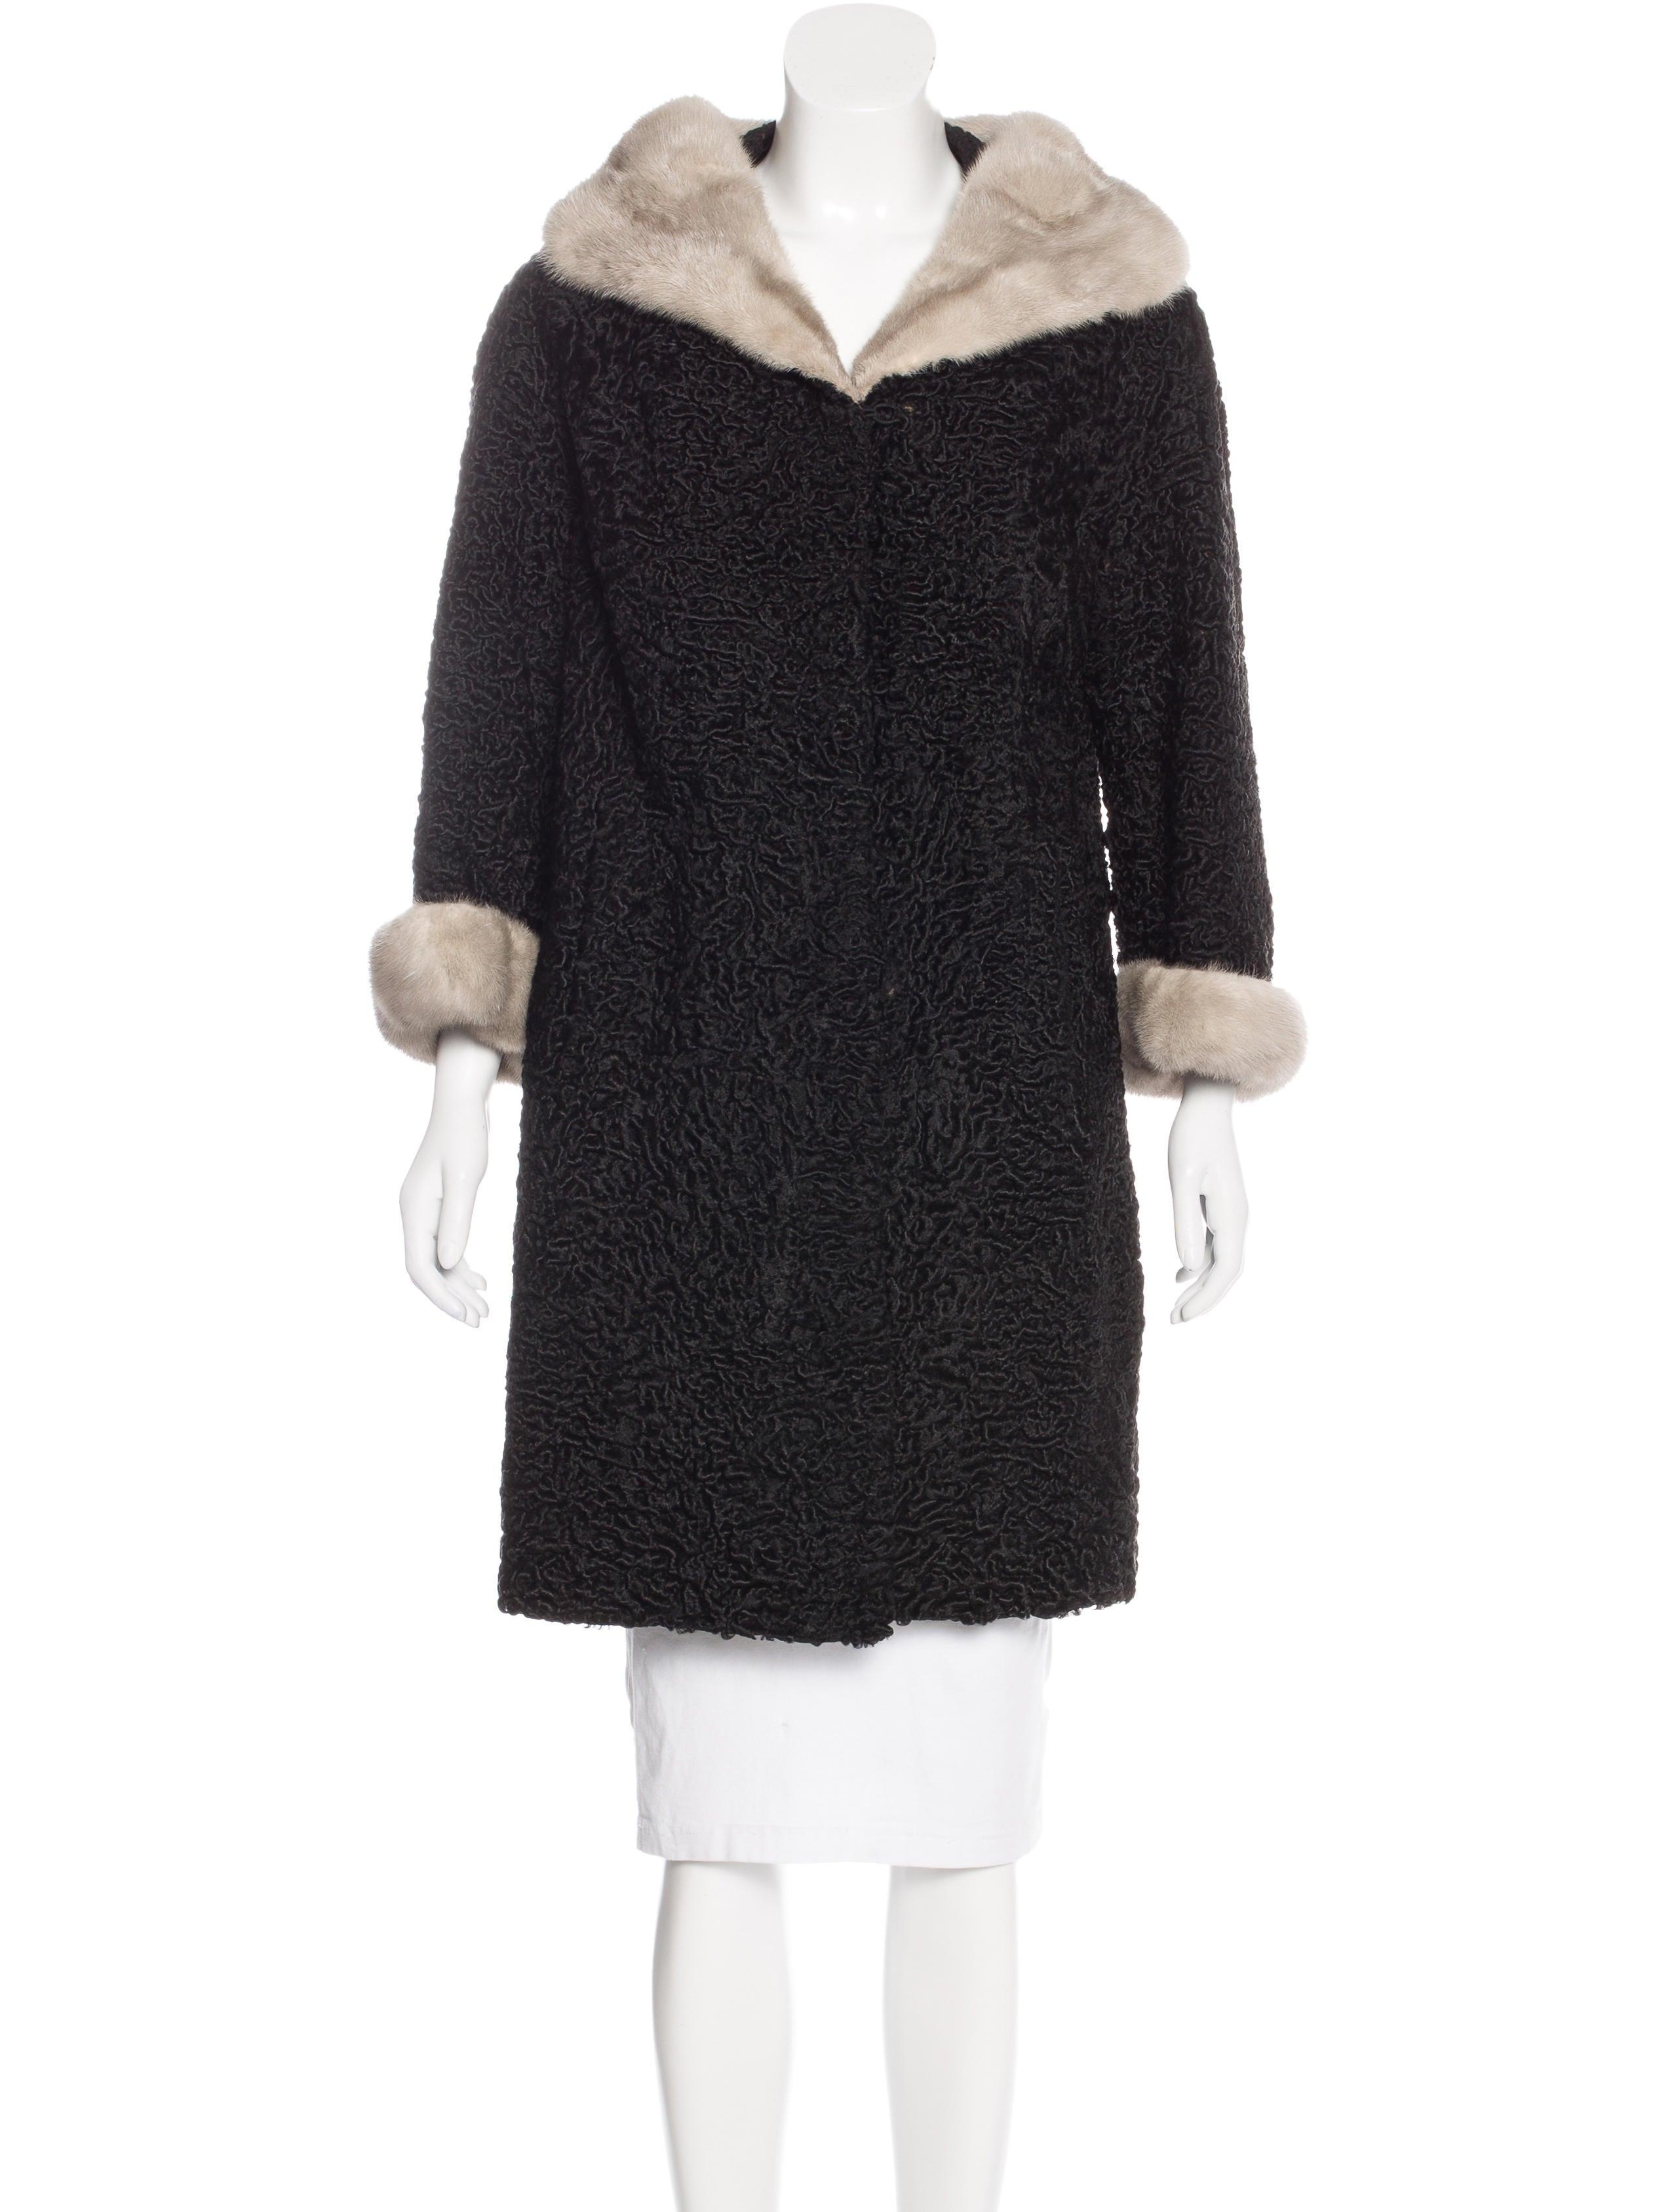 Fur Mink Amp Persian Lamb Fur Coat Clothing Fur21889